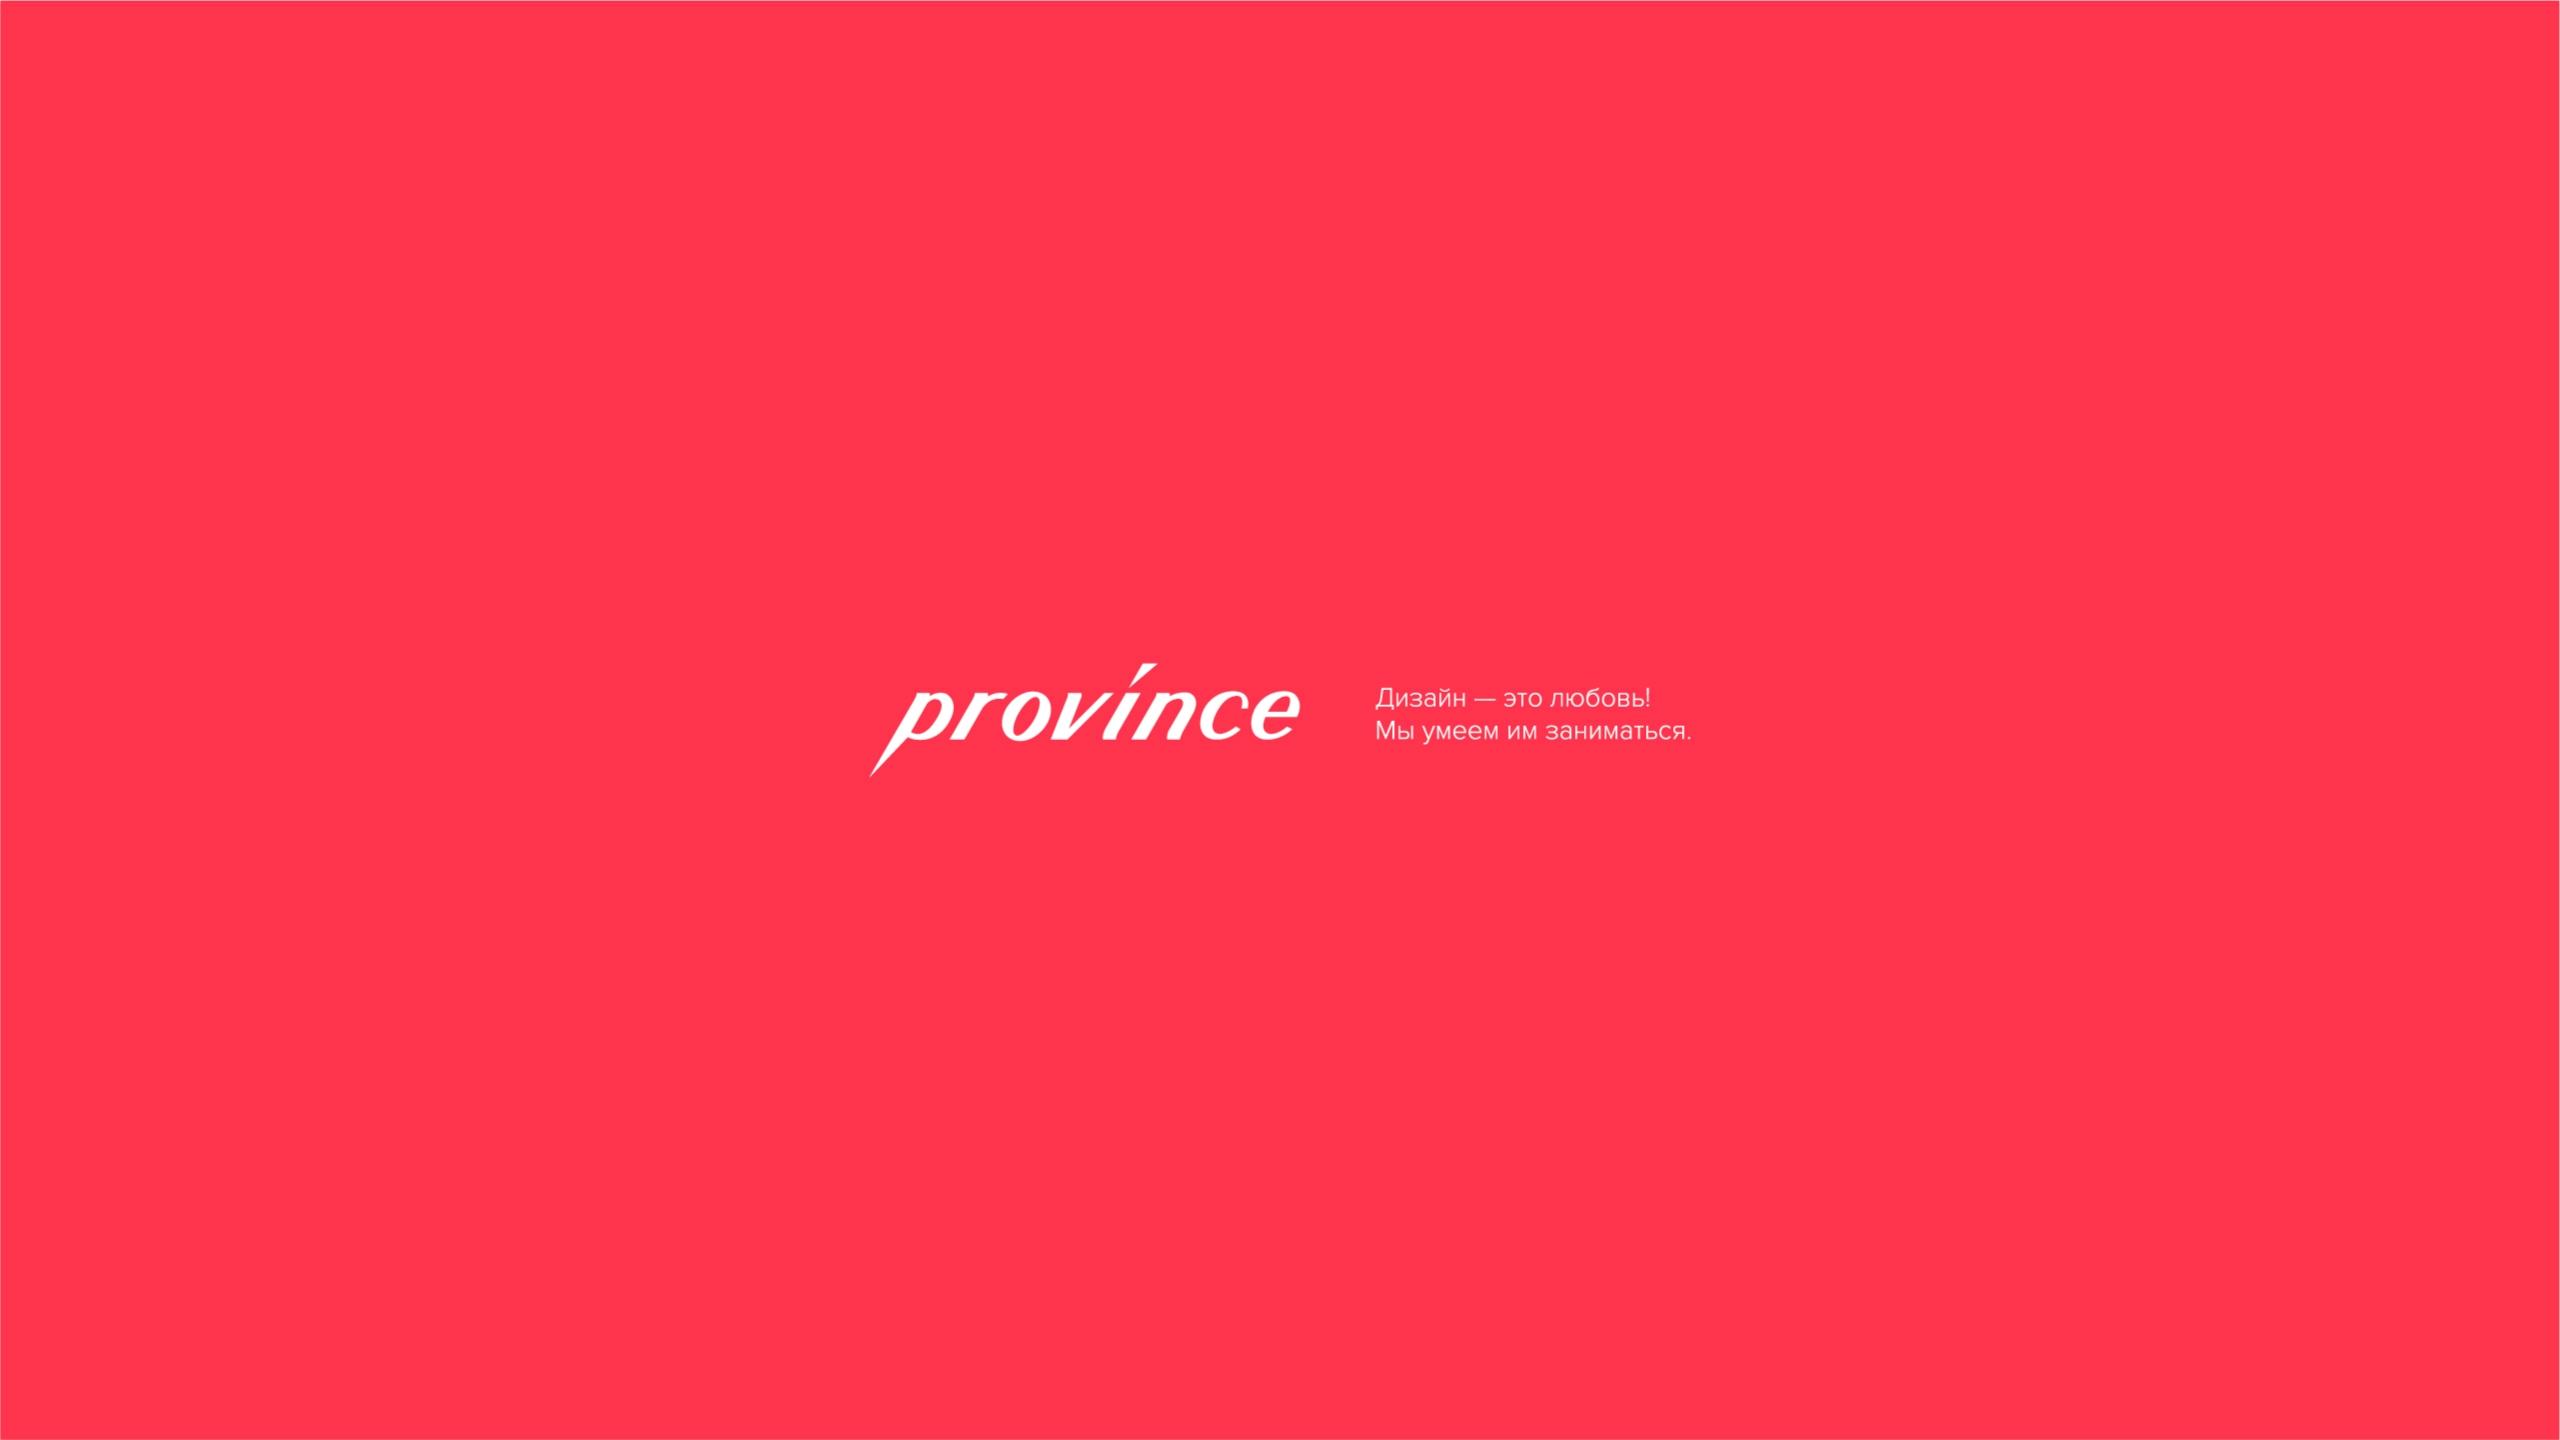 Province (@lvmdru) Cover Image